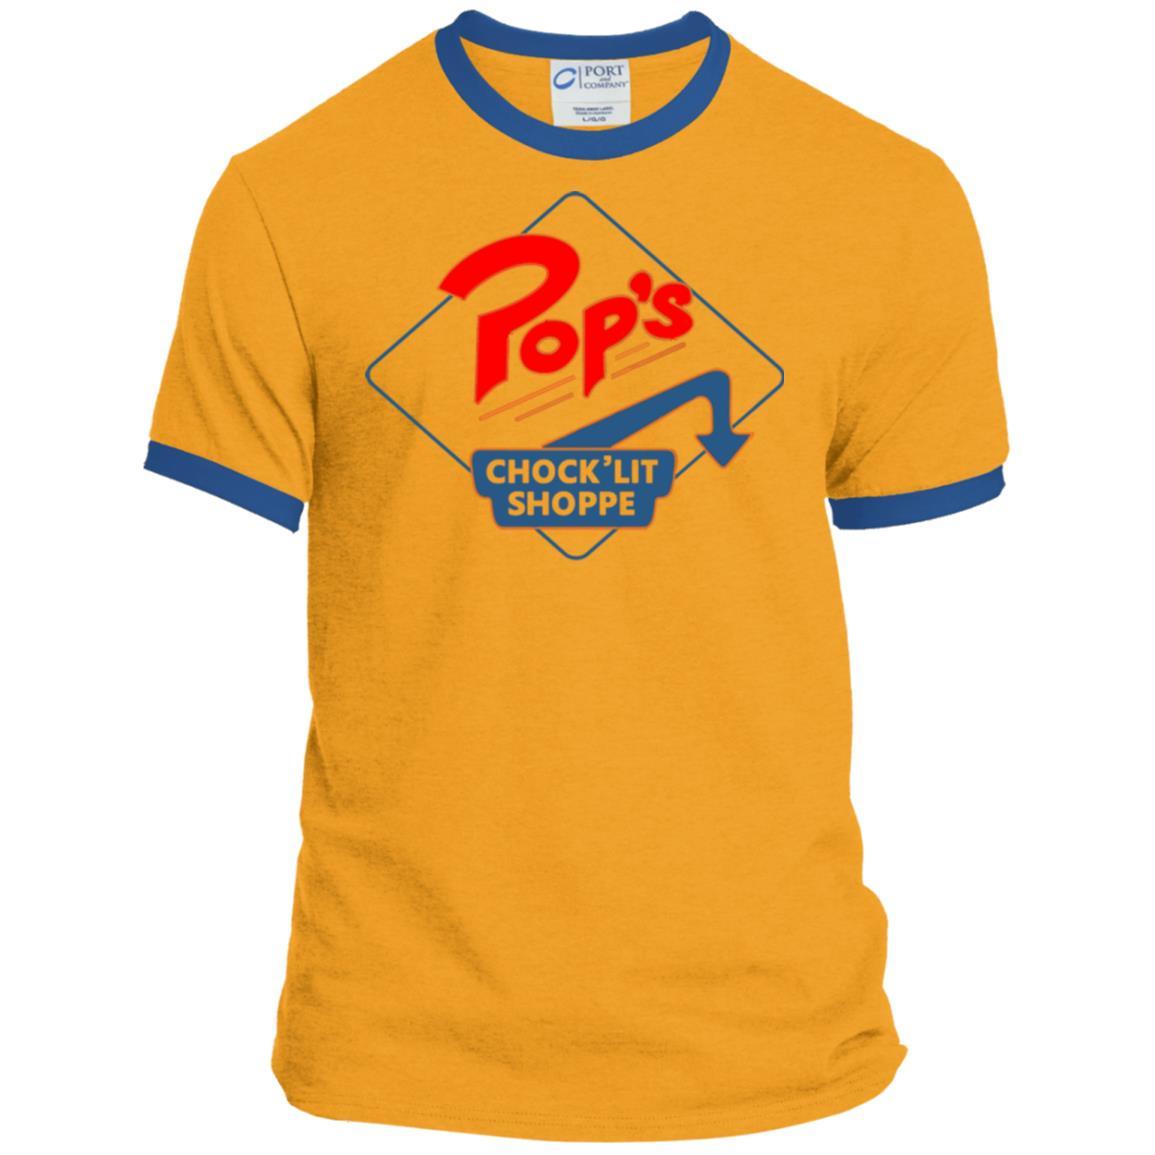 image 2089 - Riverdale Pop's Chock'lit Shoppe shirt